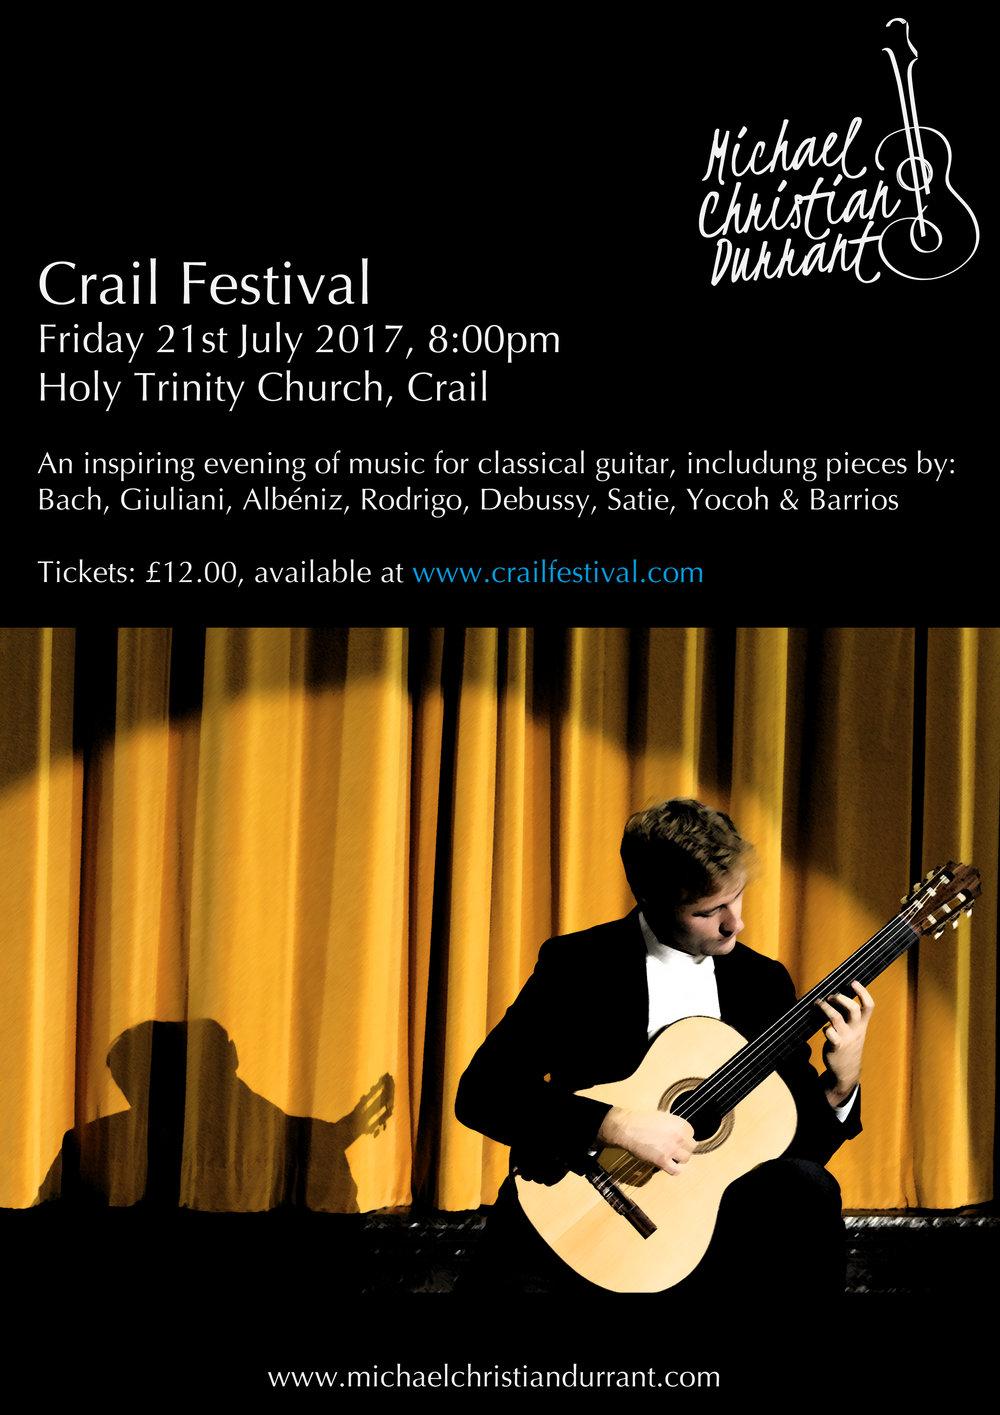 Crail Festival, Friday 21st July 2017